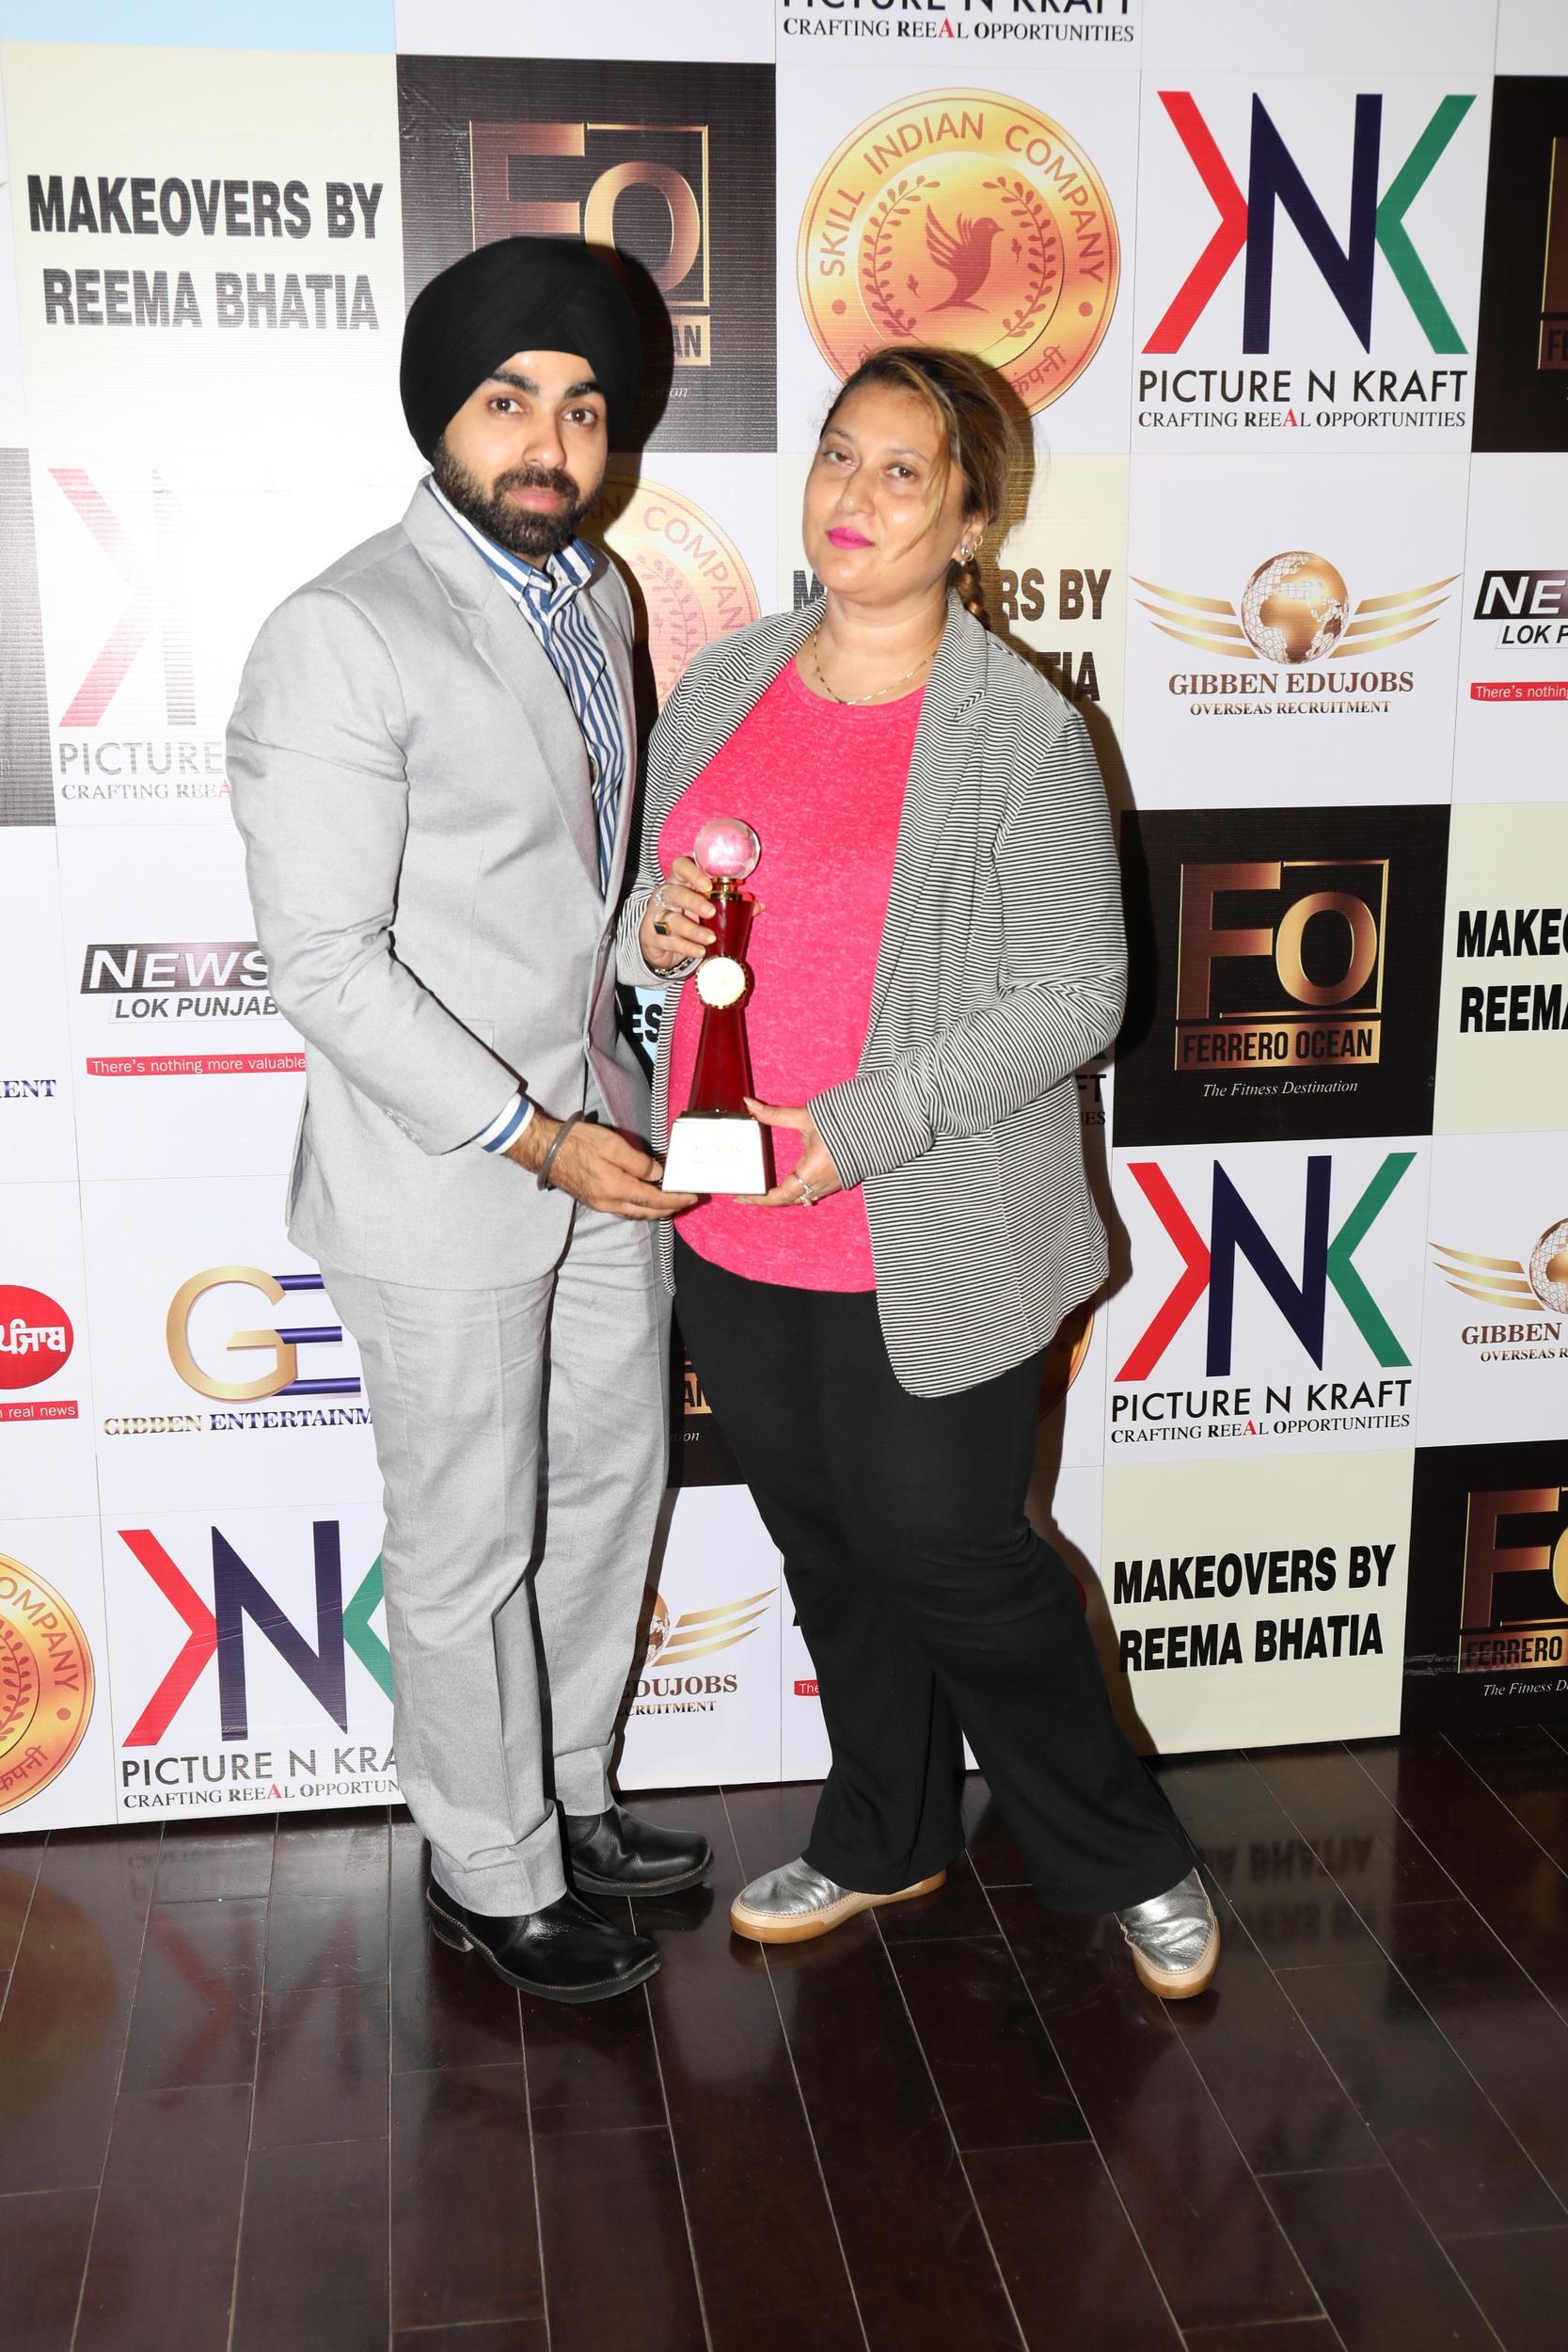 6. Angad Singh Arora - Managing Director Skill Indian Company awarding Parul Chawla AMP_8691